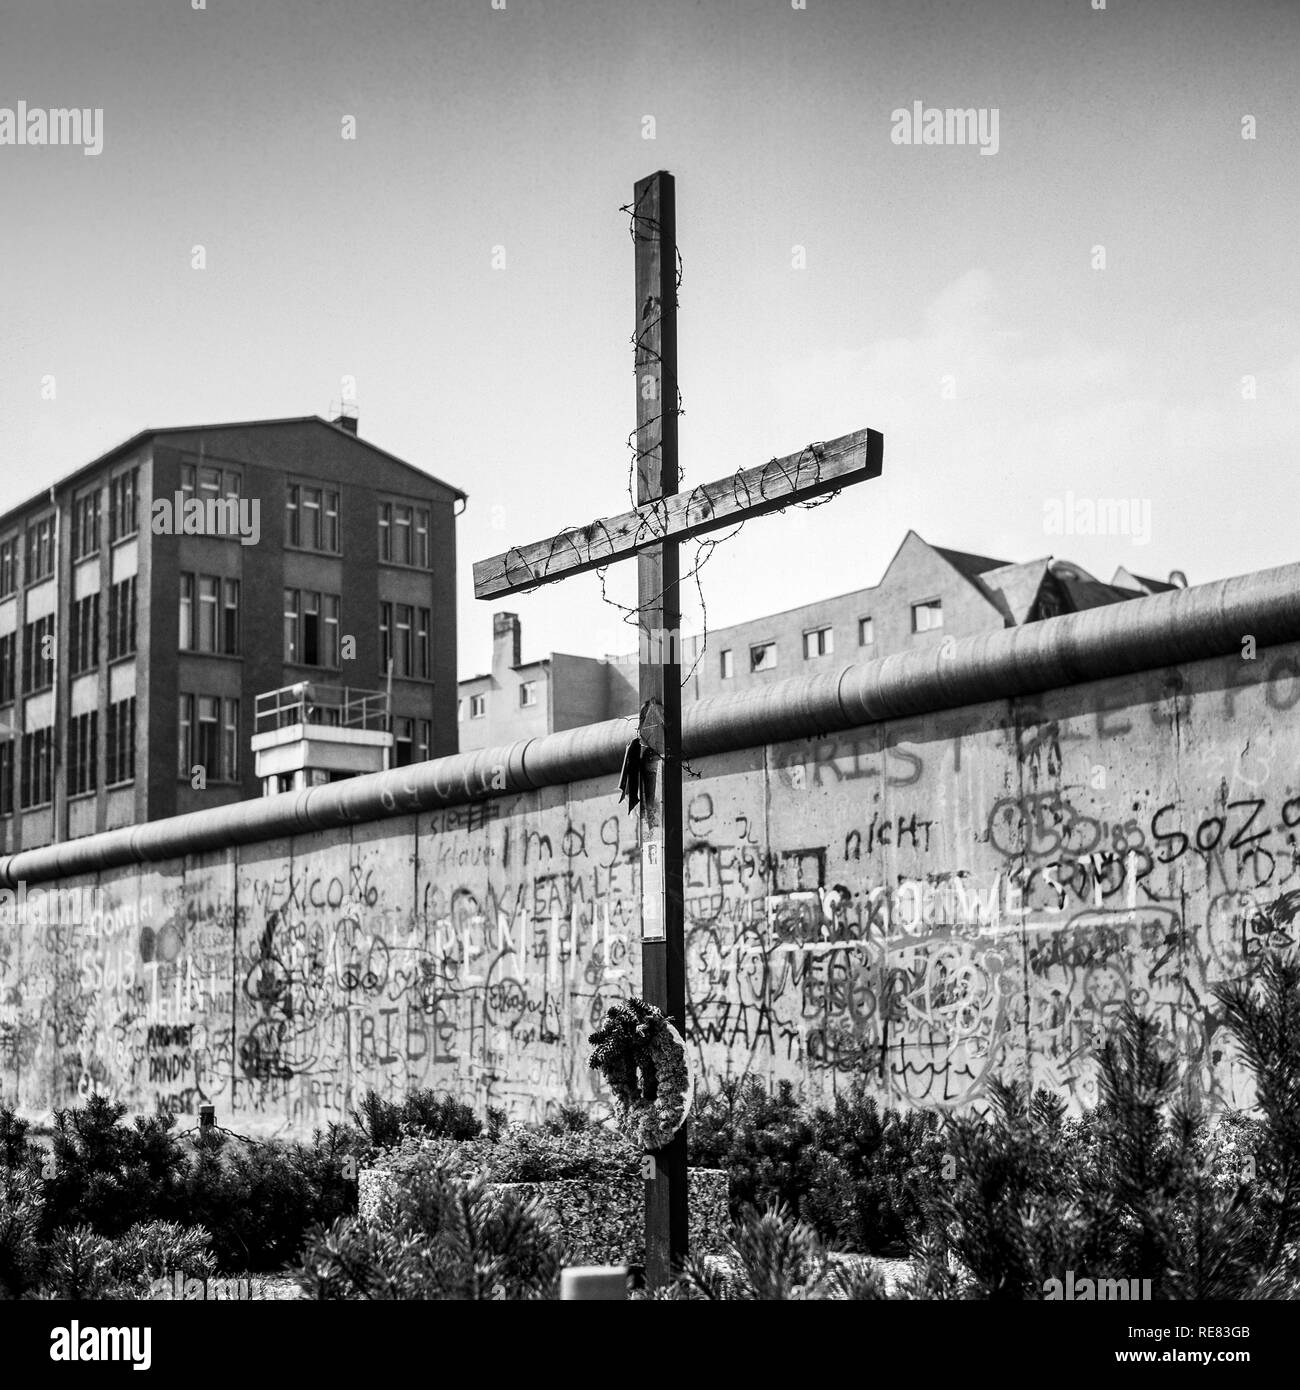 August 1986, Peter Fechter Memorial with cross, graffitis on the Berlin Wall, Zimmerstrasse street, Kreuzberg, West Berlin side, Germany, Europe, - Stock Image